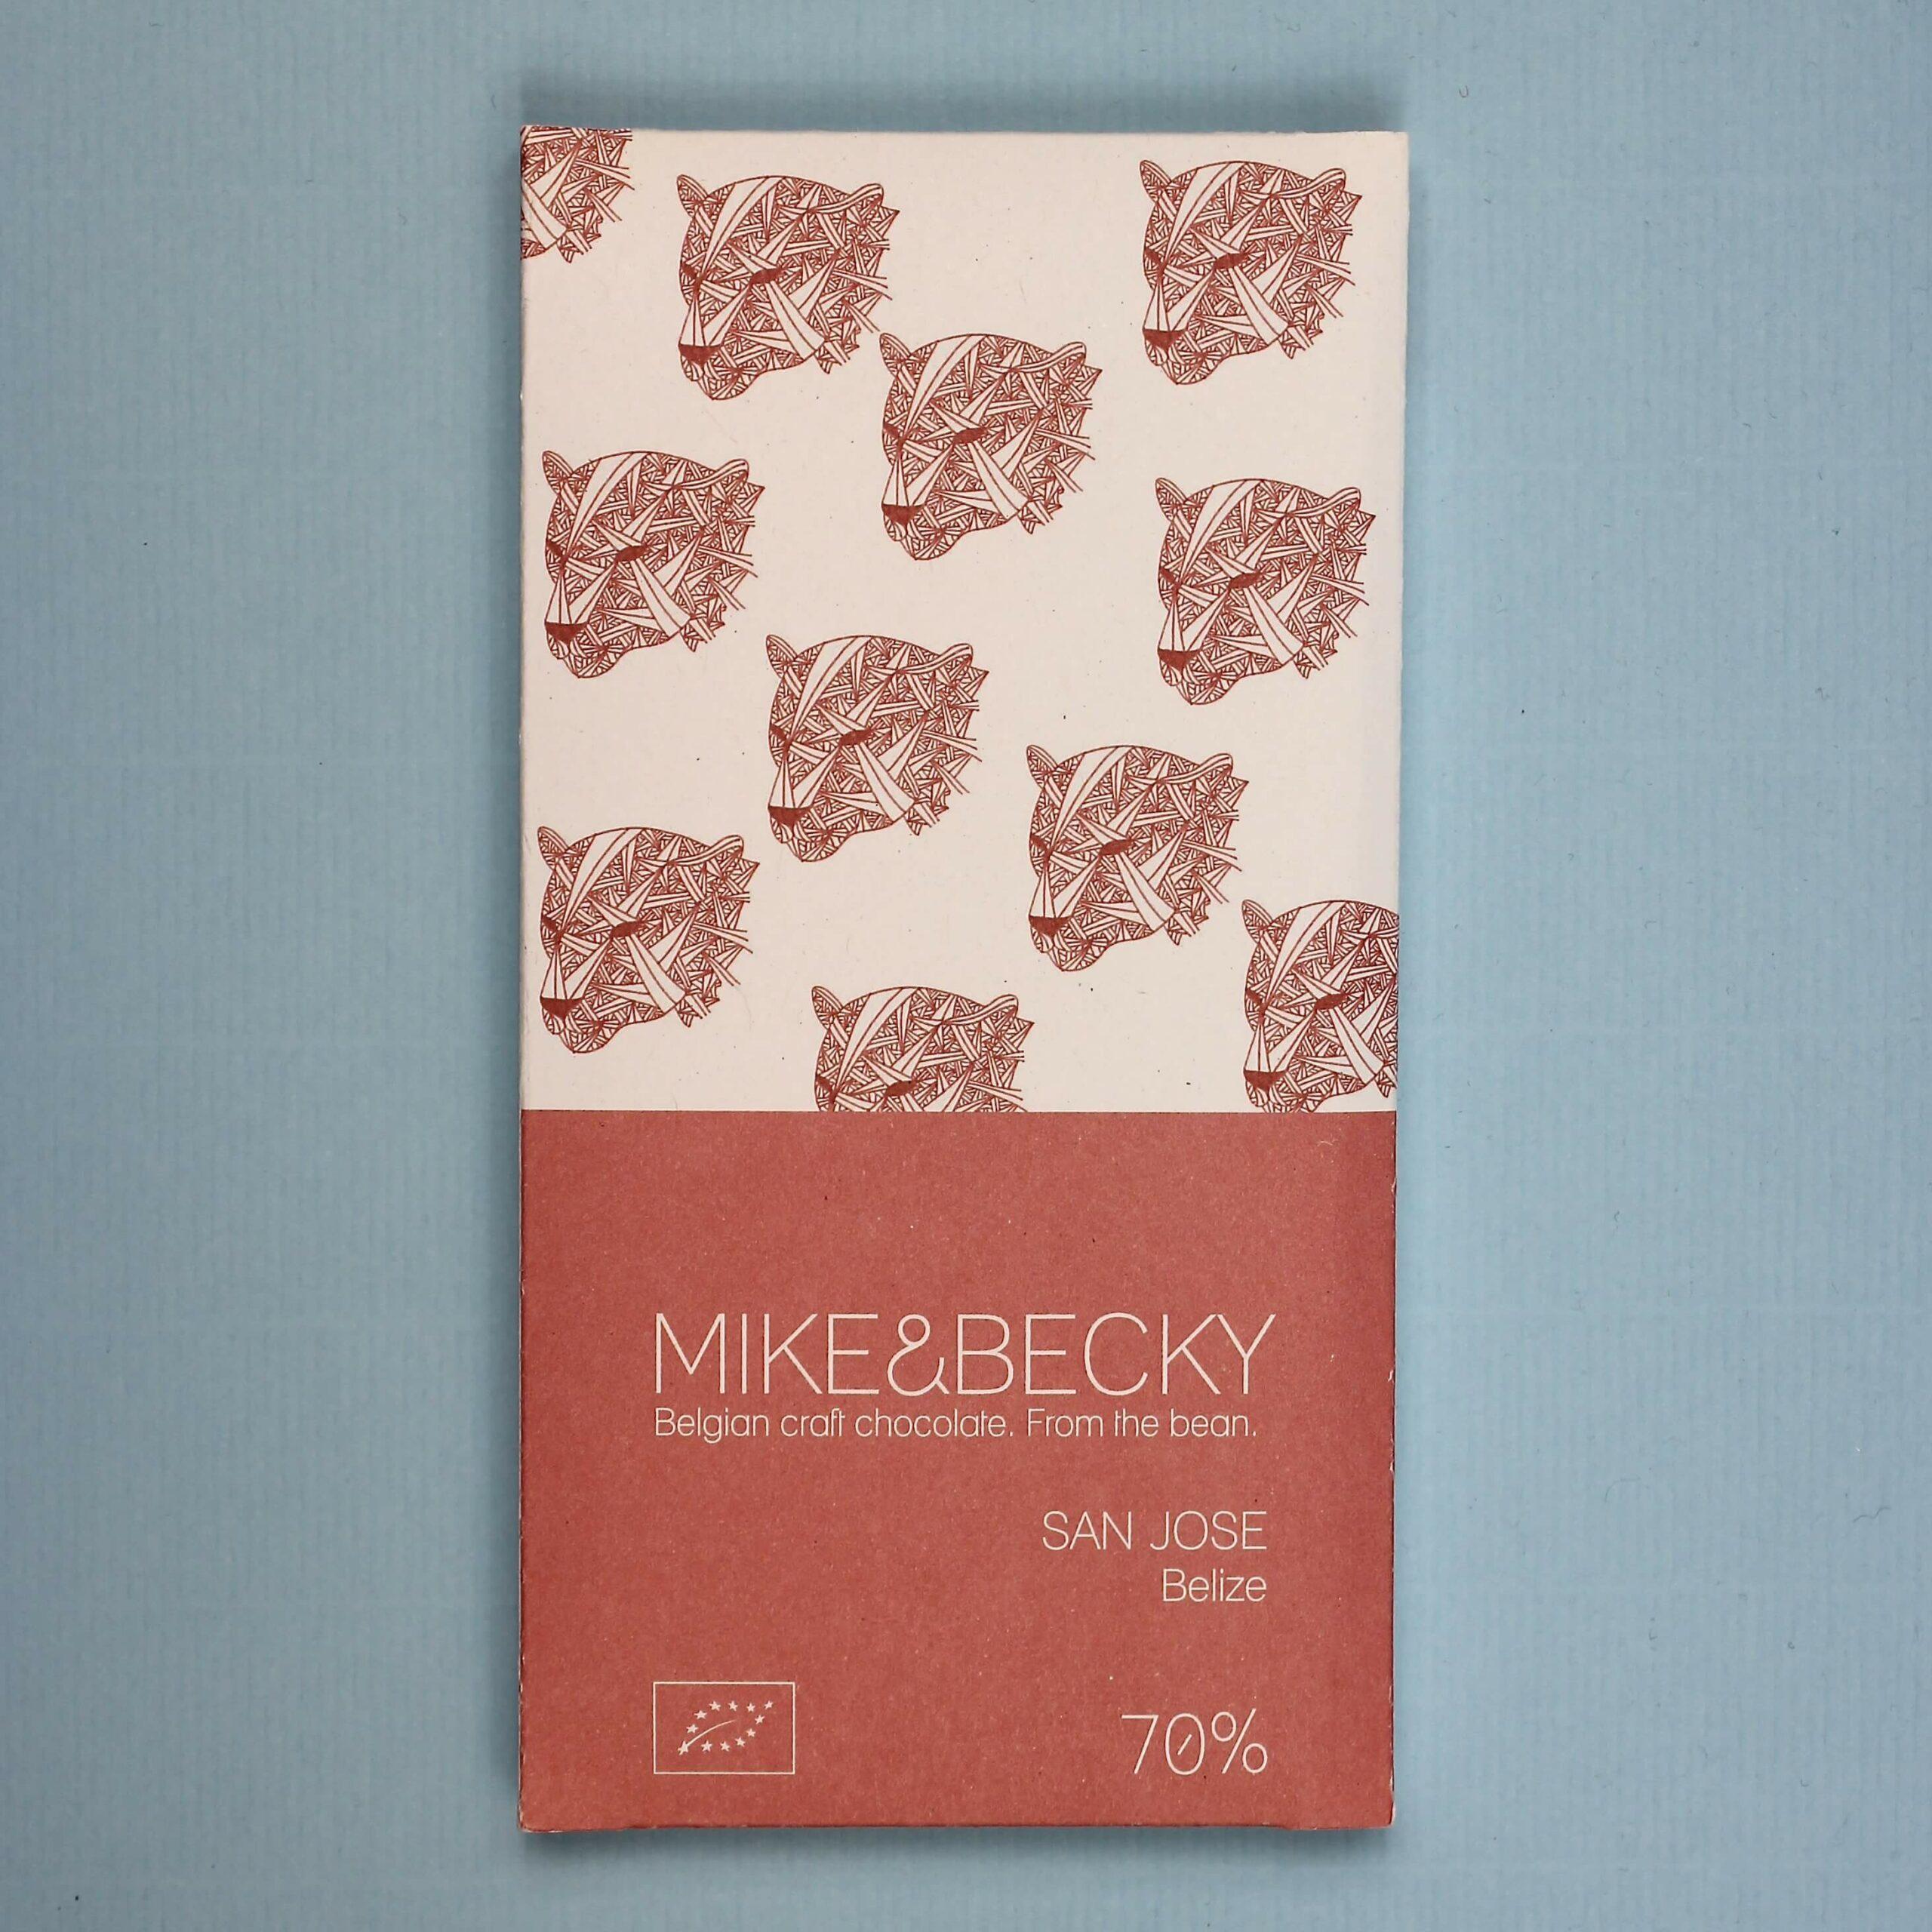 mike becky san jose belize 70